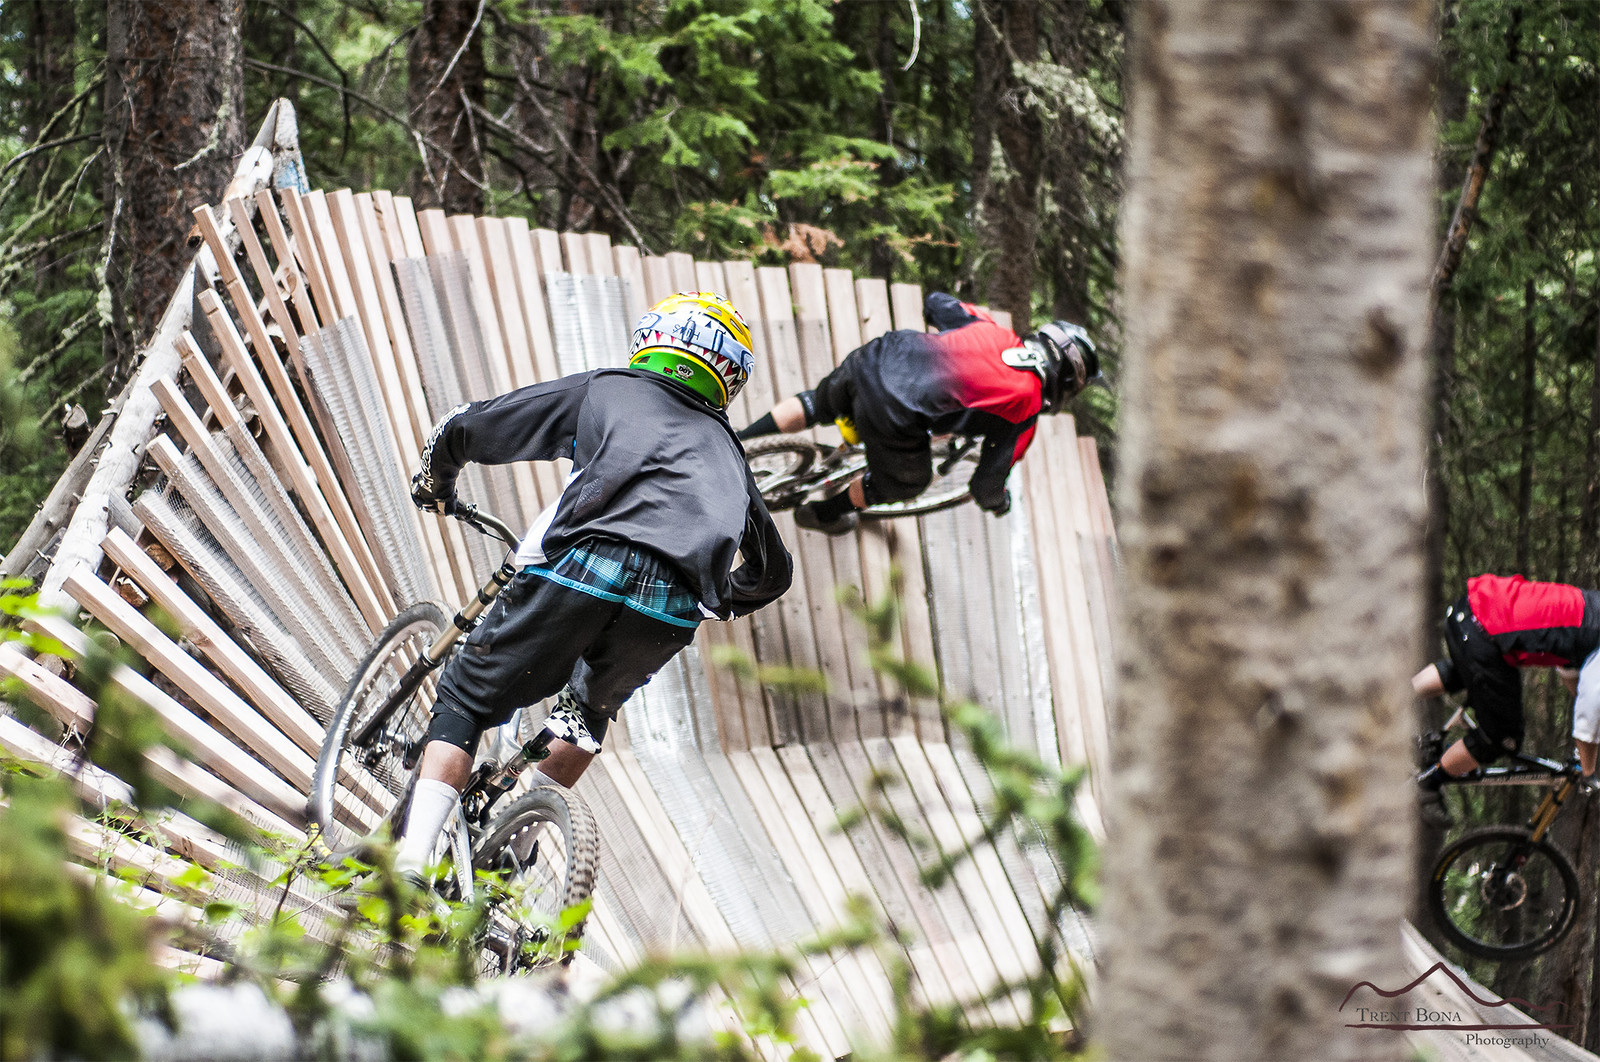 Woods Wall Ride - Evolution Bike Park - Mountain Biking Pictures - Vital MTB